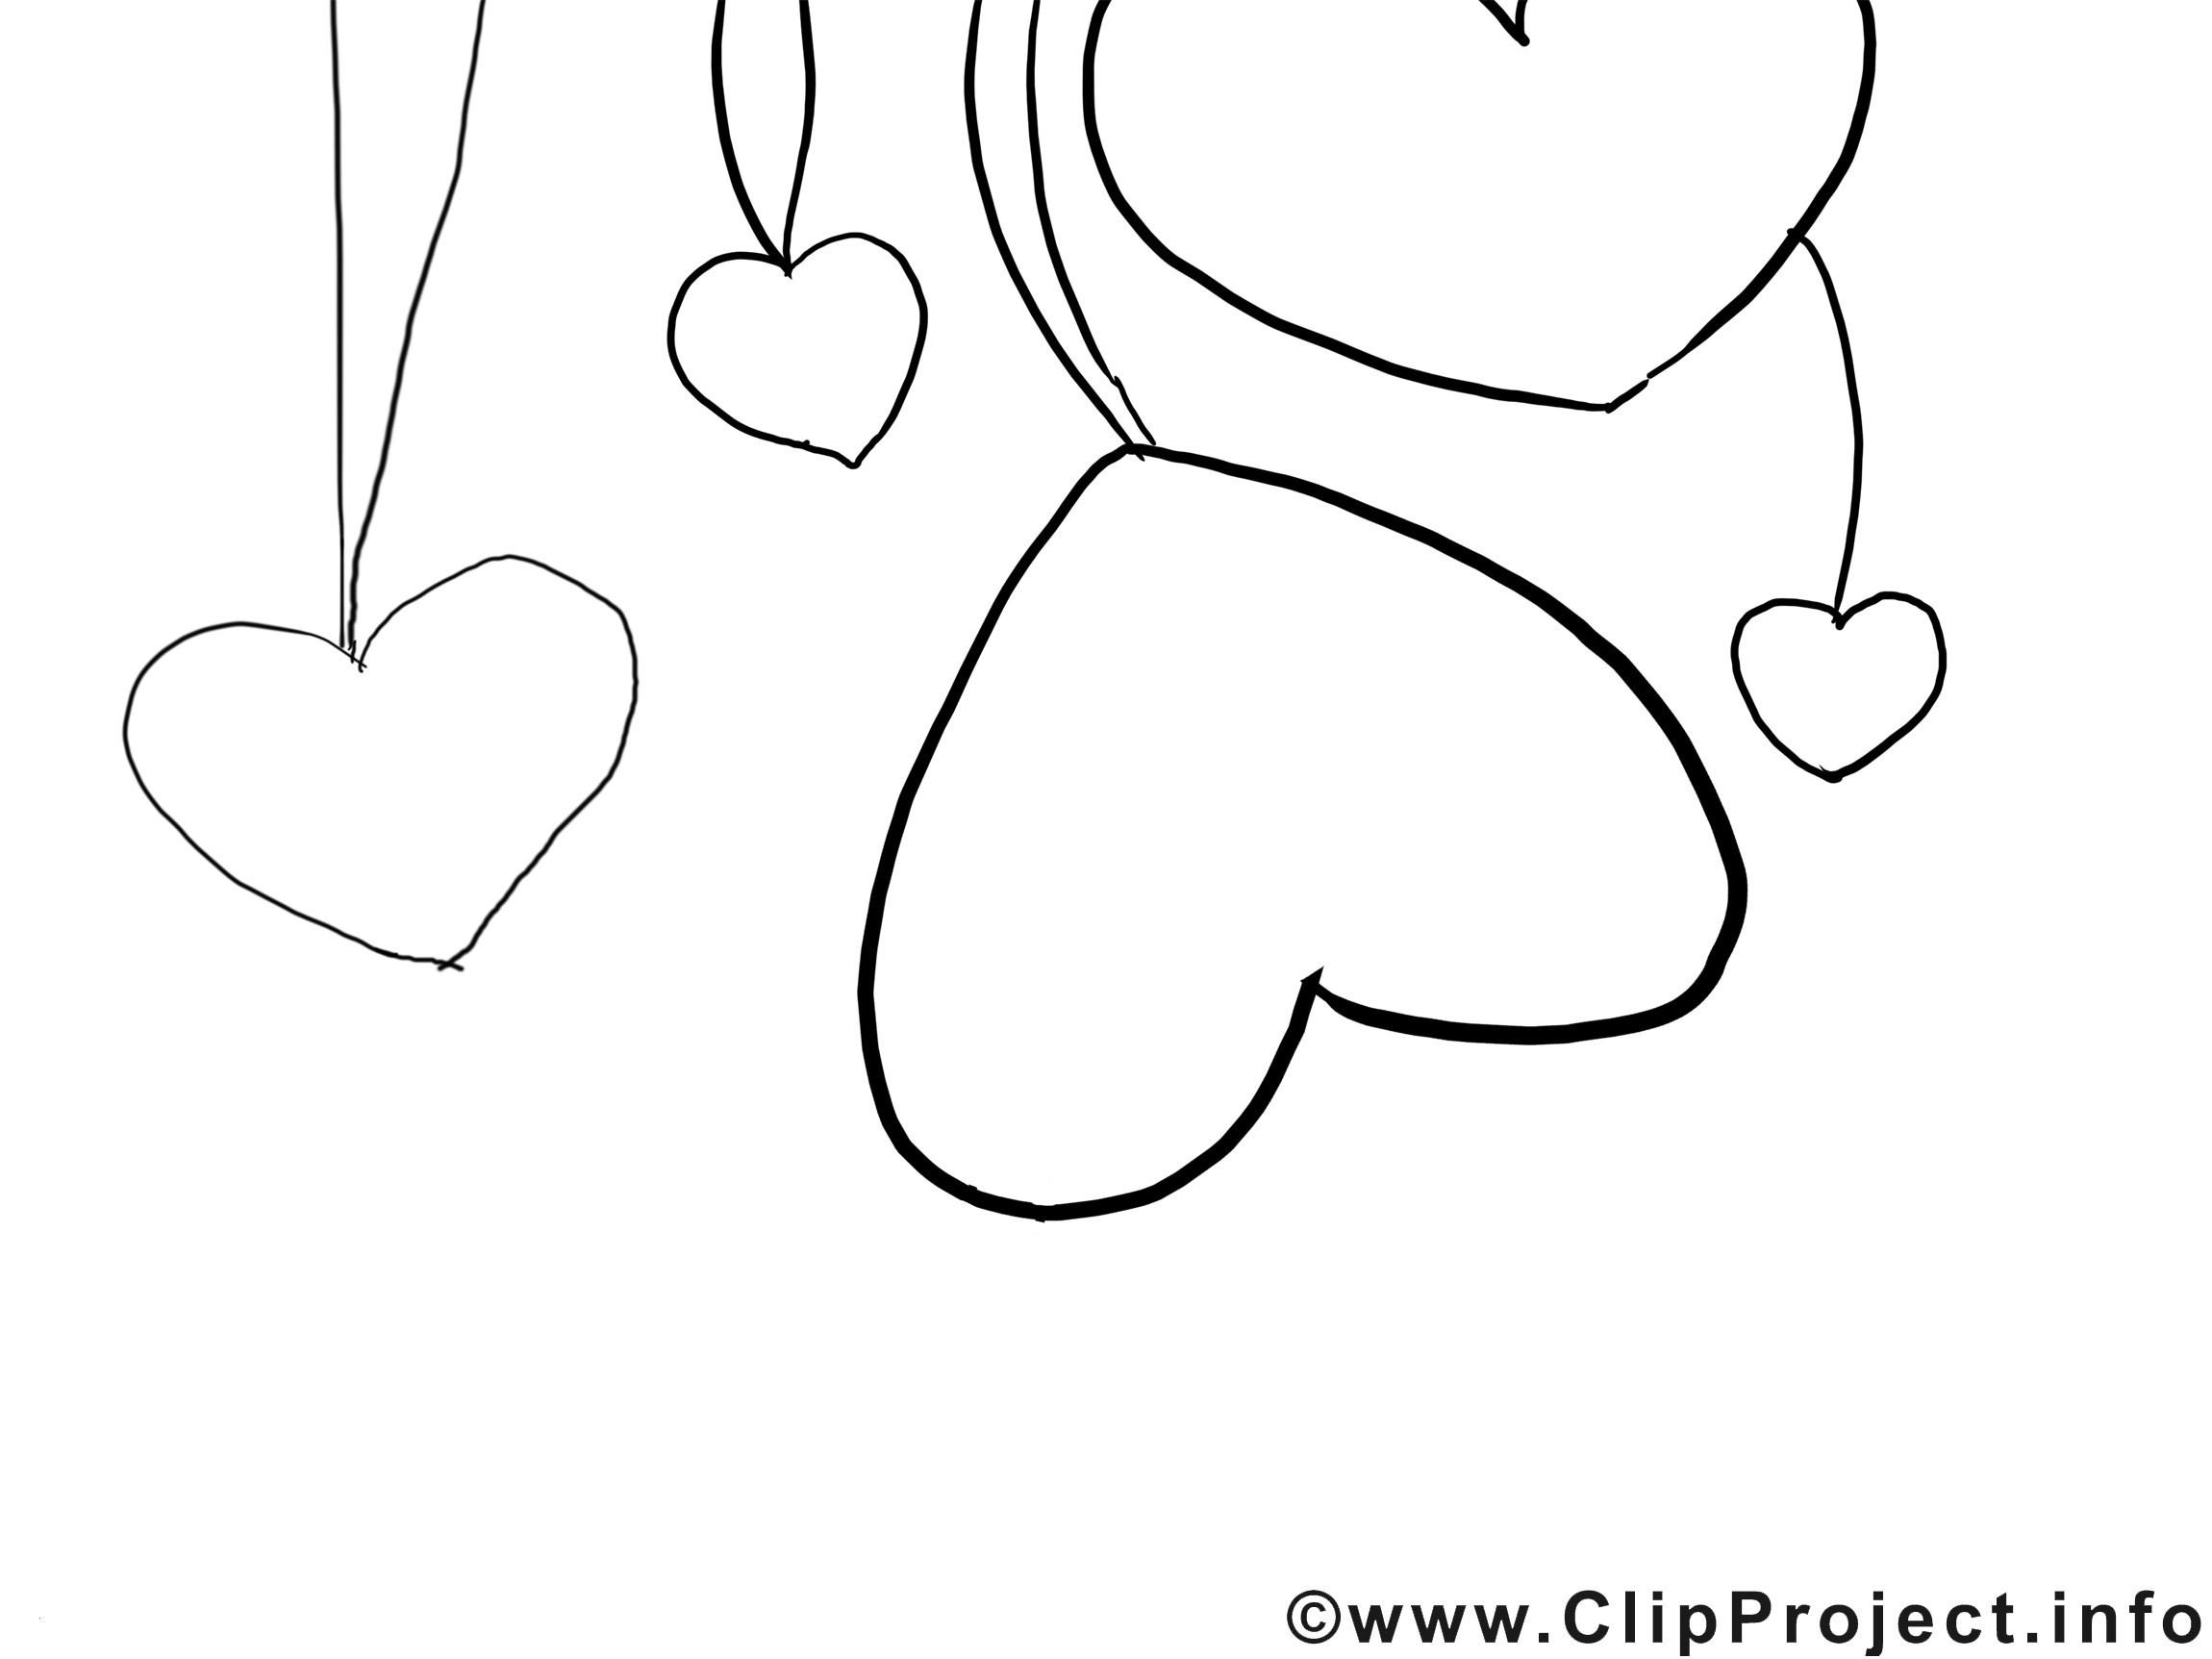 Ausmalbilder Mandala Herzen Inspirierend Ausmalbilder Von Herzen Schön Rio Ausmalbilder Neu Bugatti White Stock